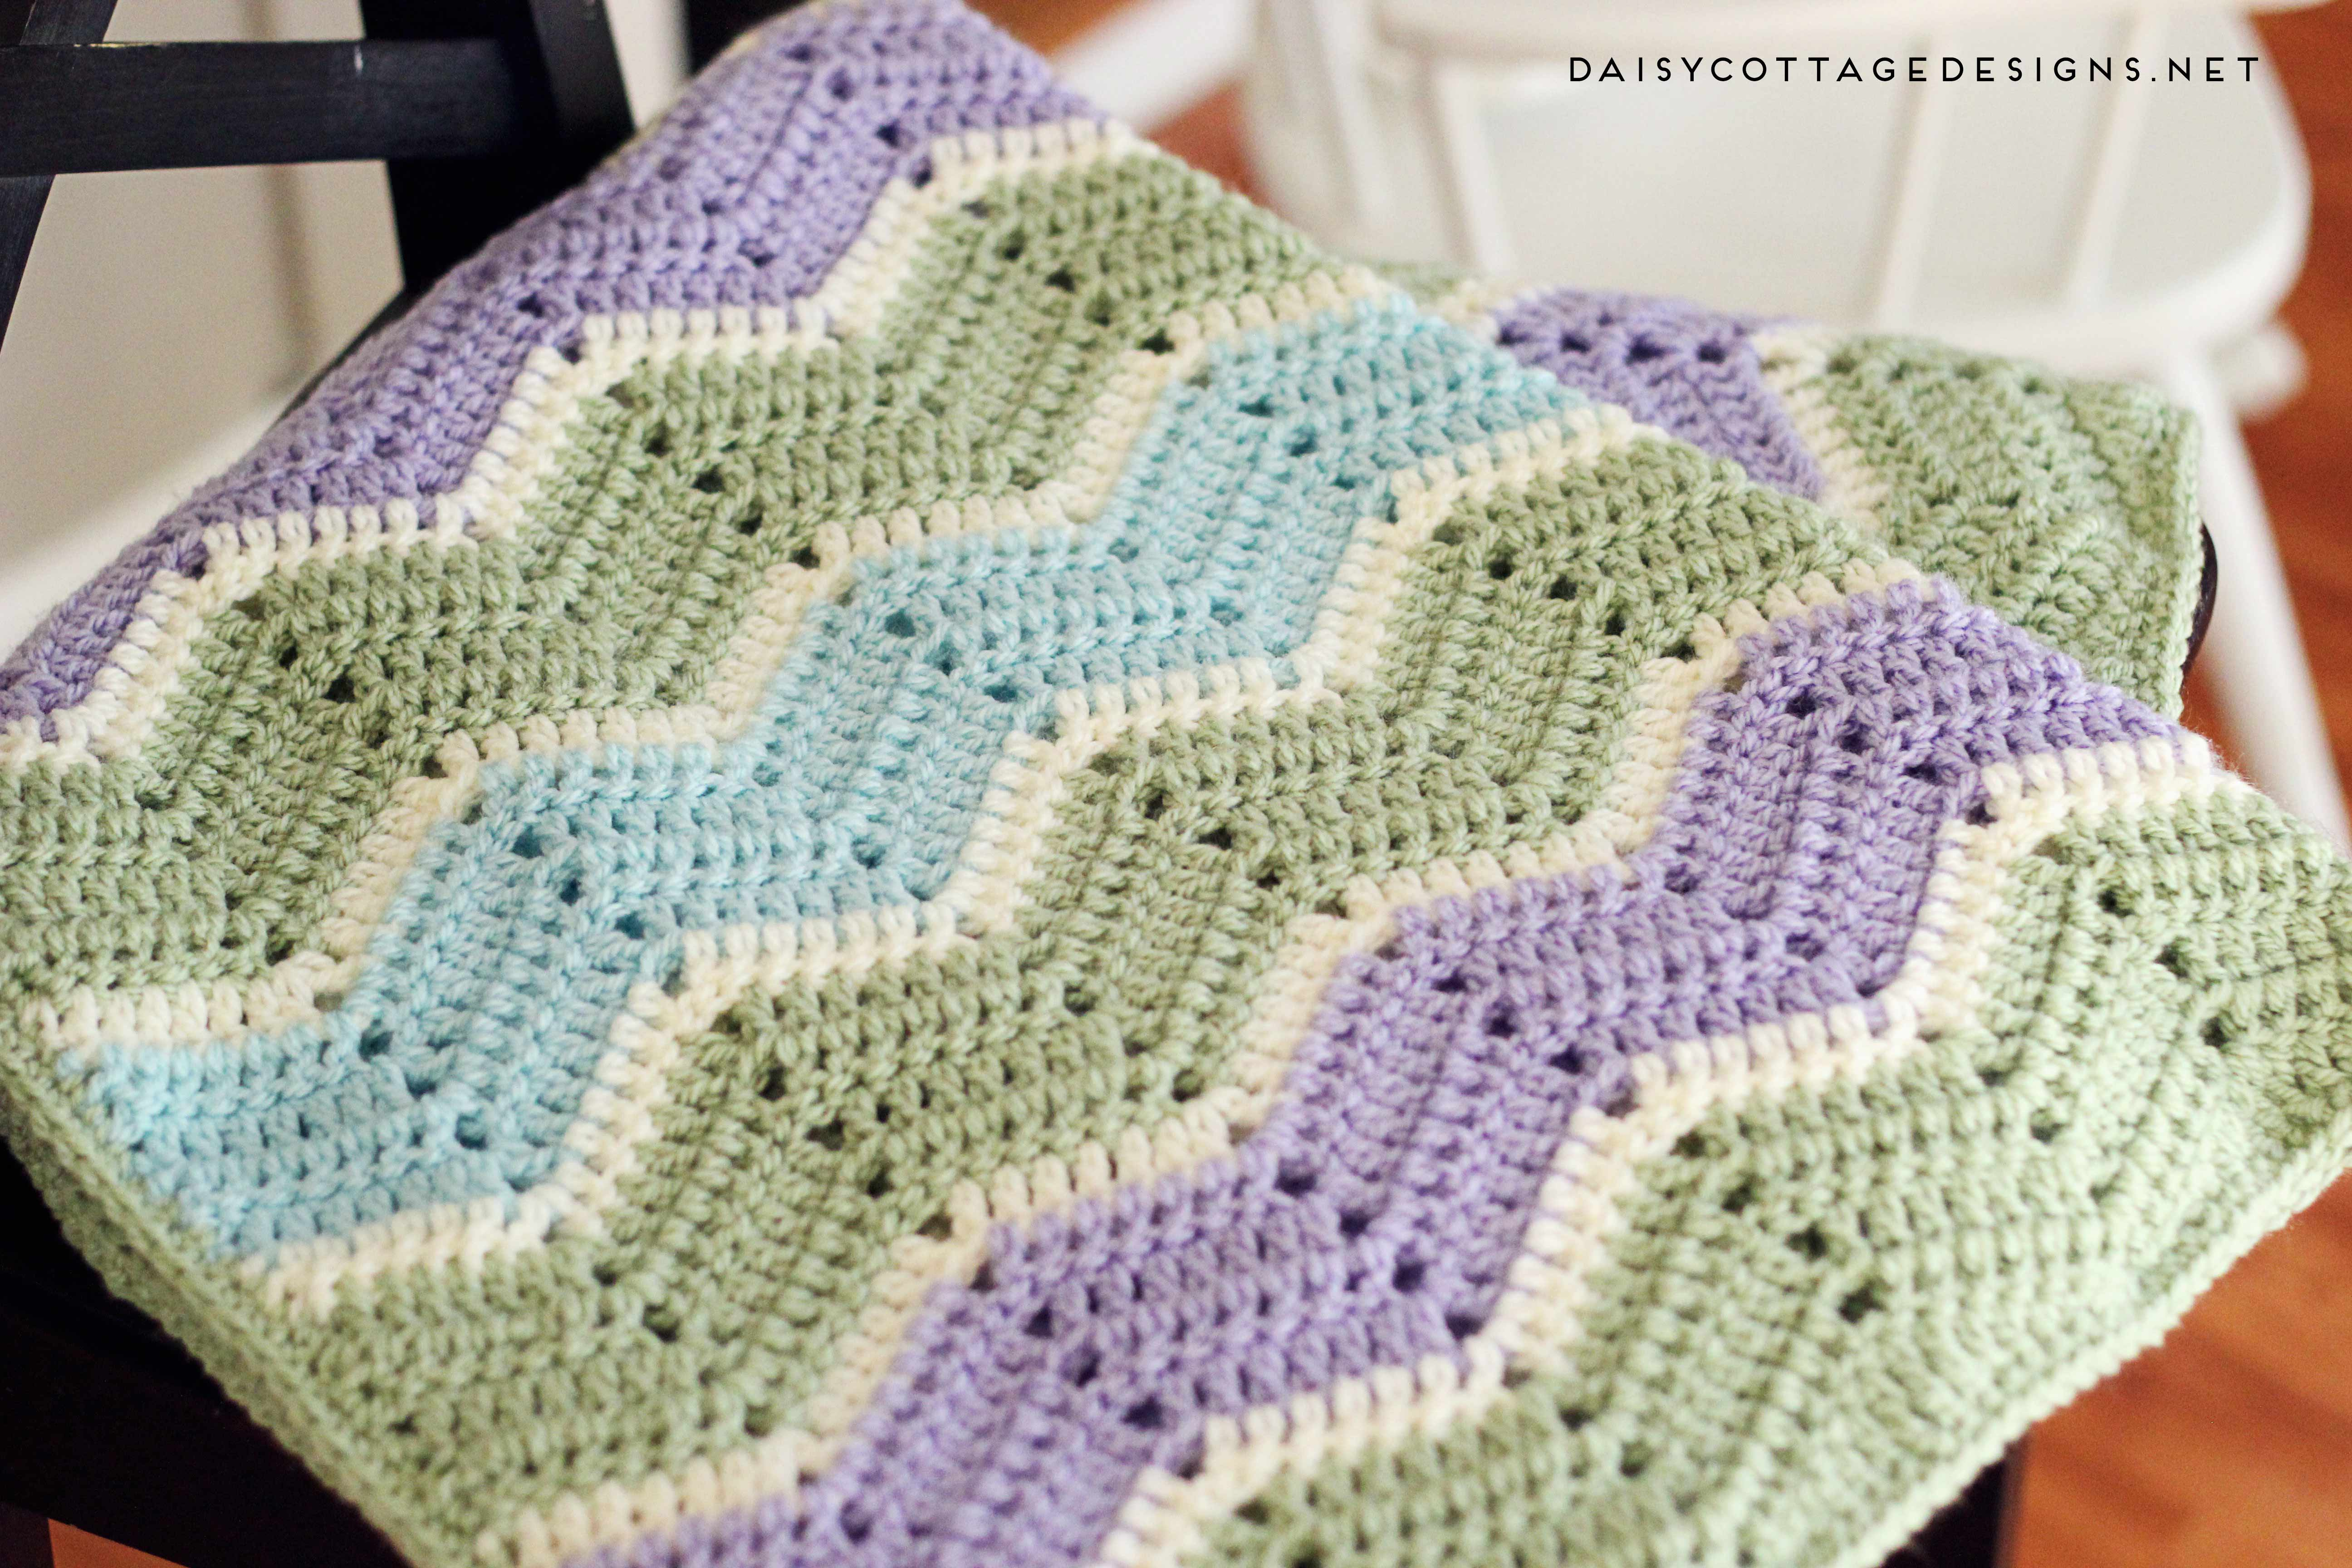 crochet patterns use this chevron blanket crochet pattern from daisy cottage designs to  create katsbjx